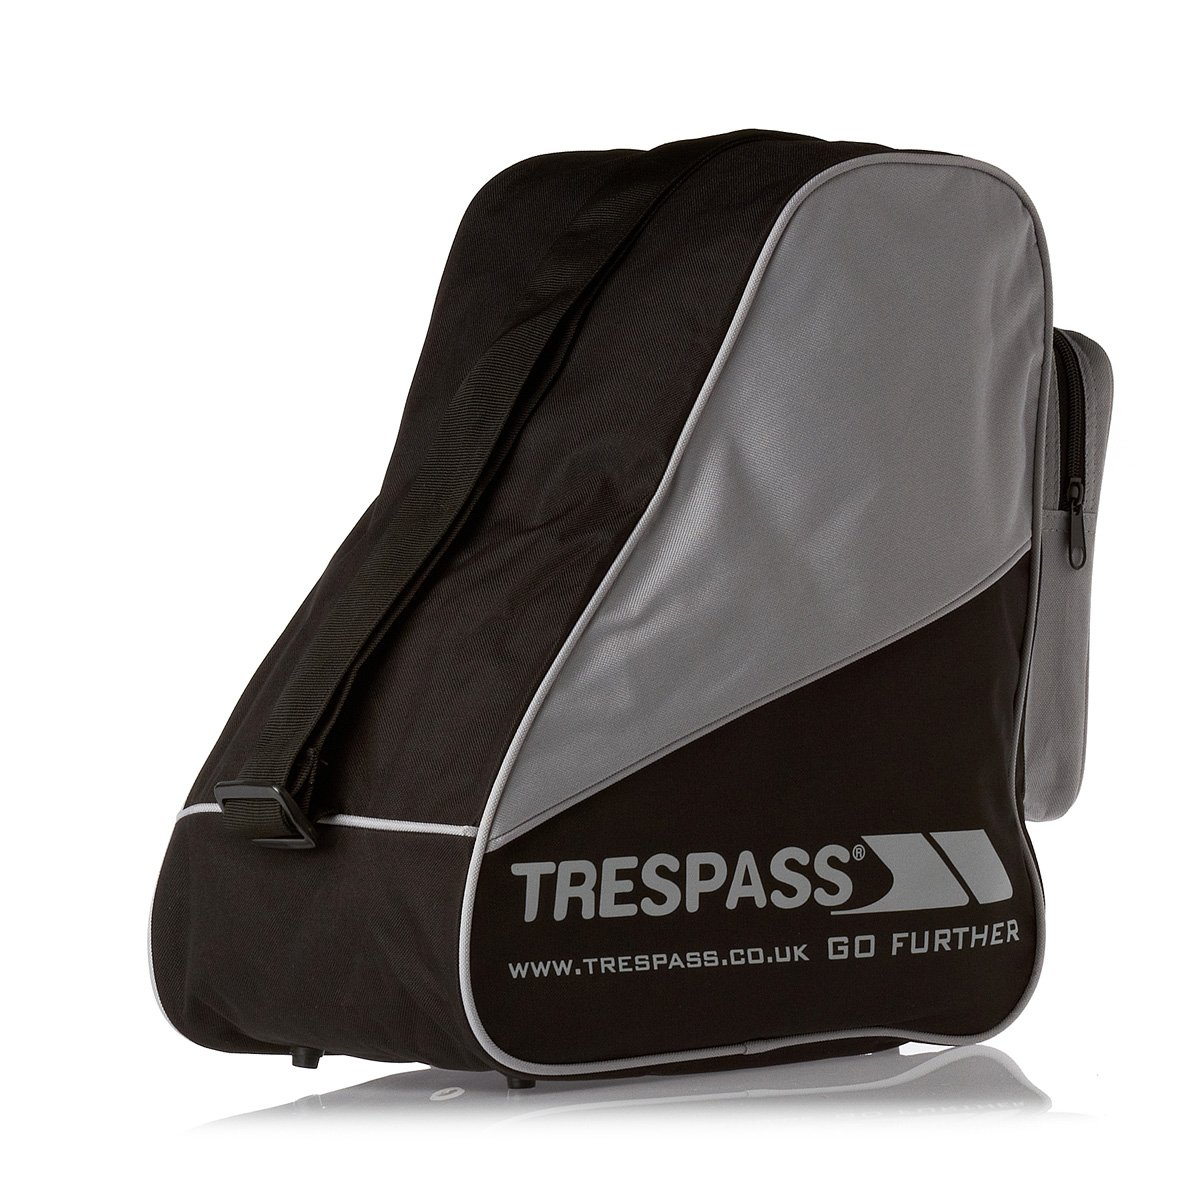 Trespass - Mochila para botas de Esquí Modelo Stormfront - Nieve/Snowboard color negro UUACBAB20011_BLKEACH